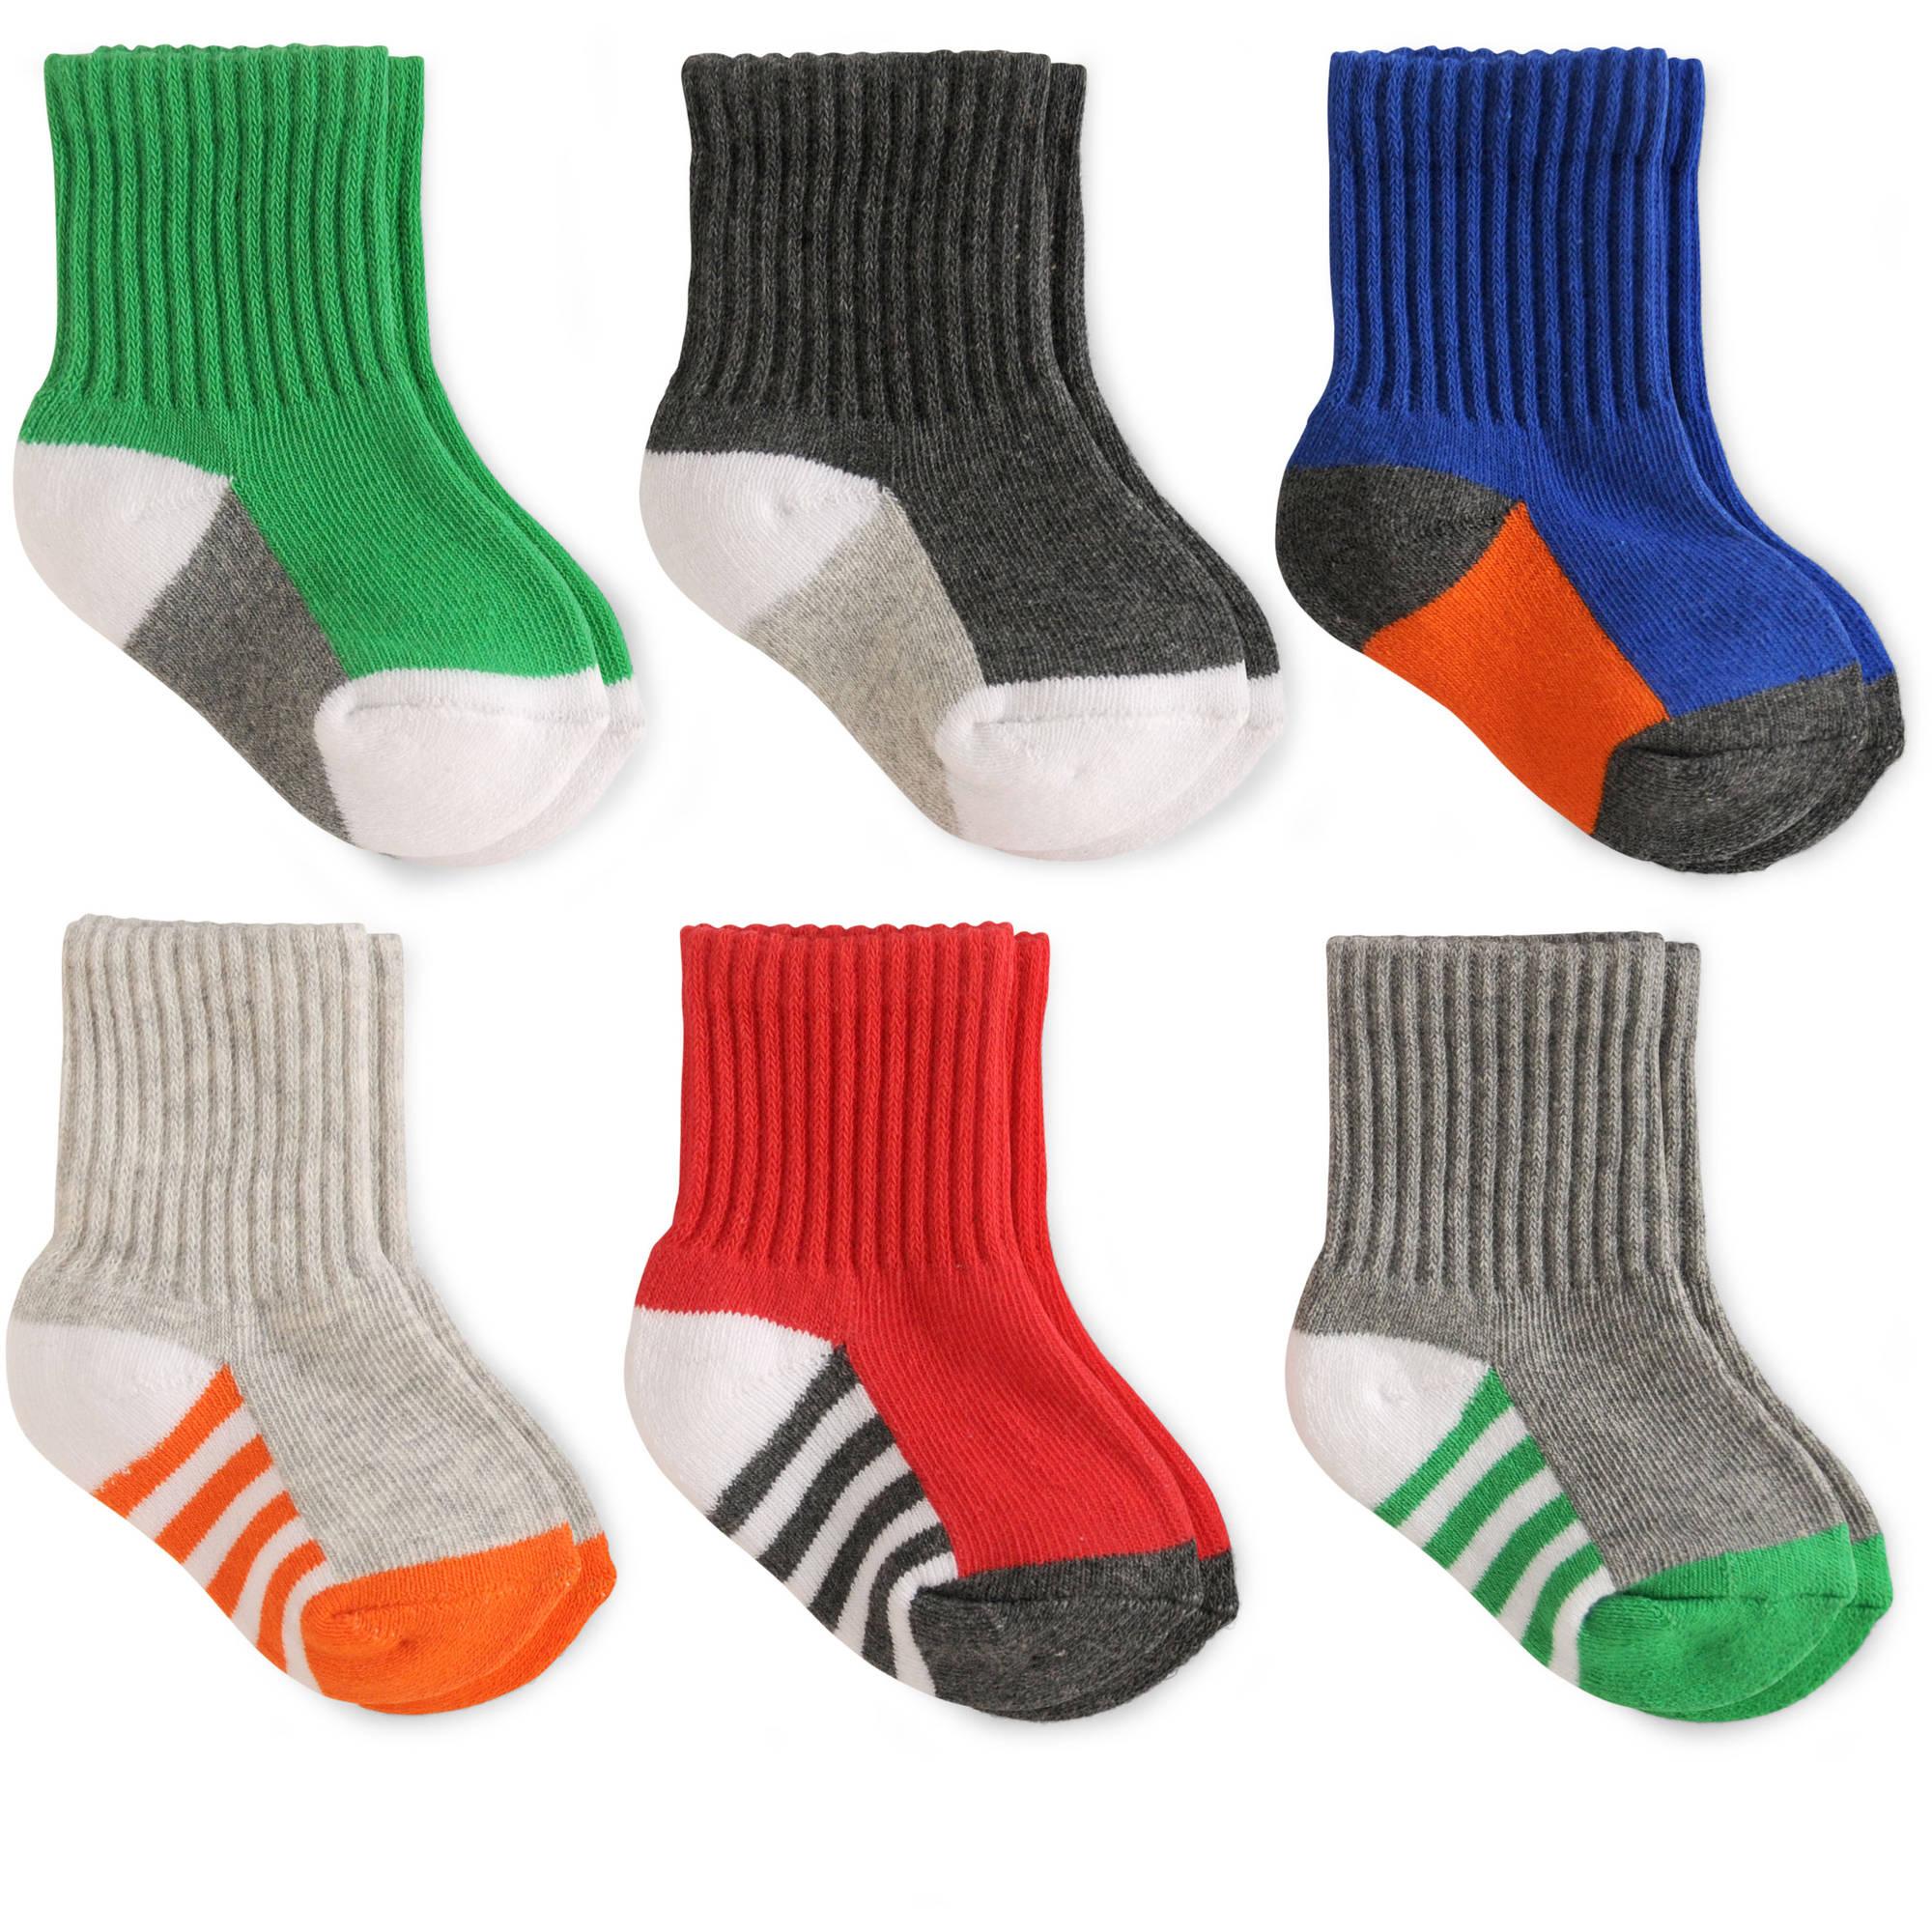 Garanimals Baby Toddler Boy Assorted Socks, 6-Pack